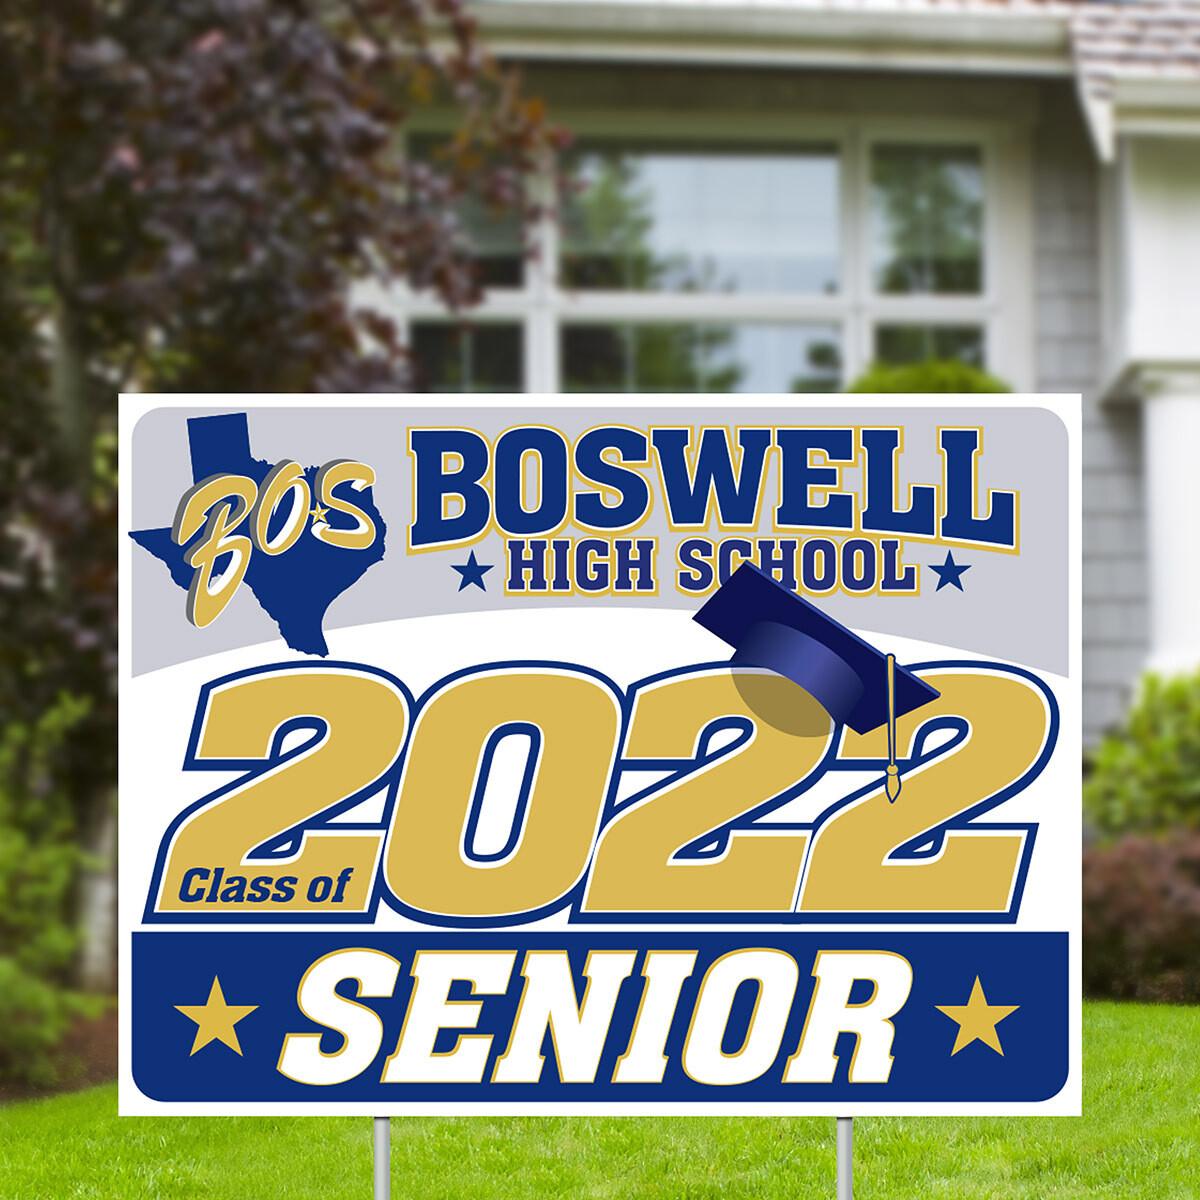 Boswell High School (2 styles)